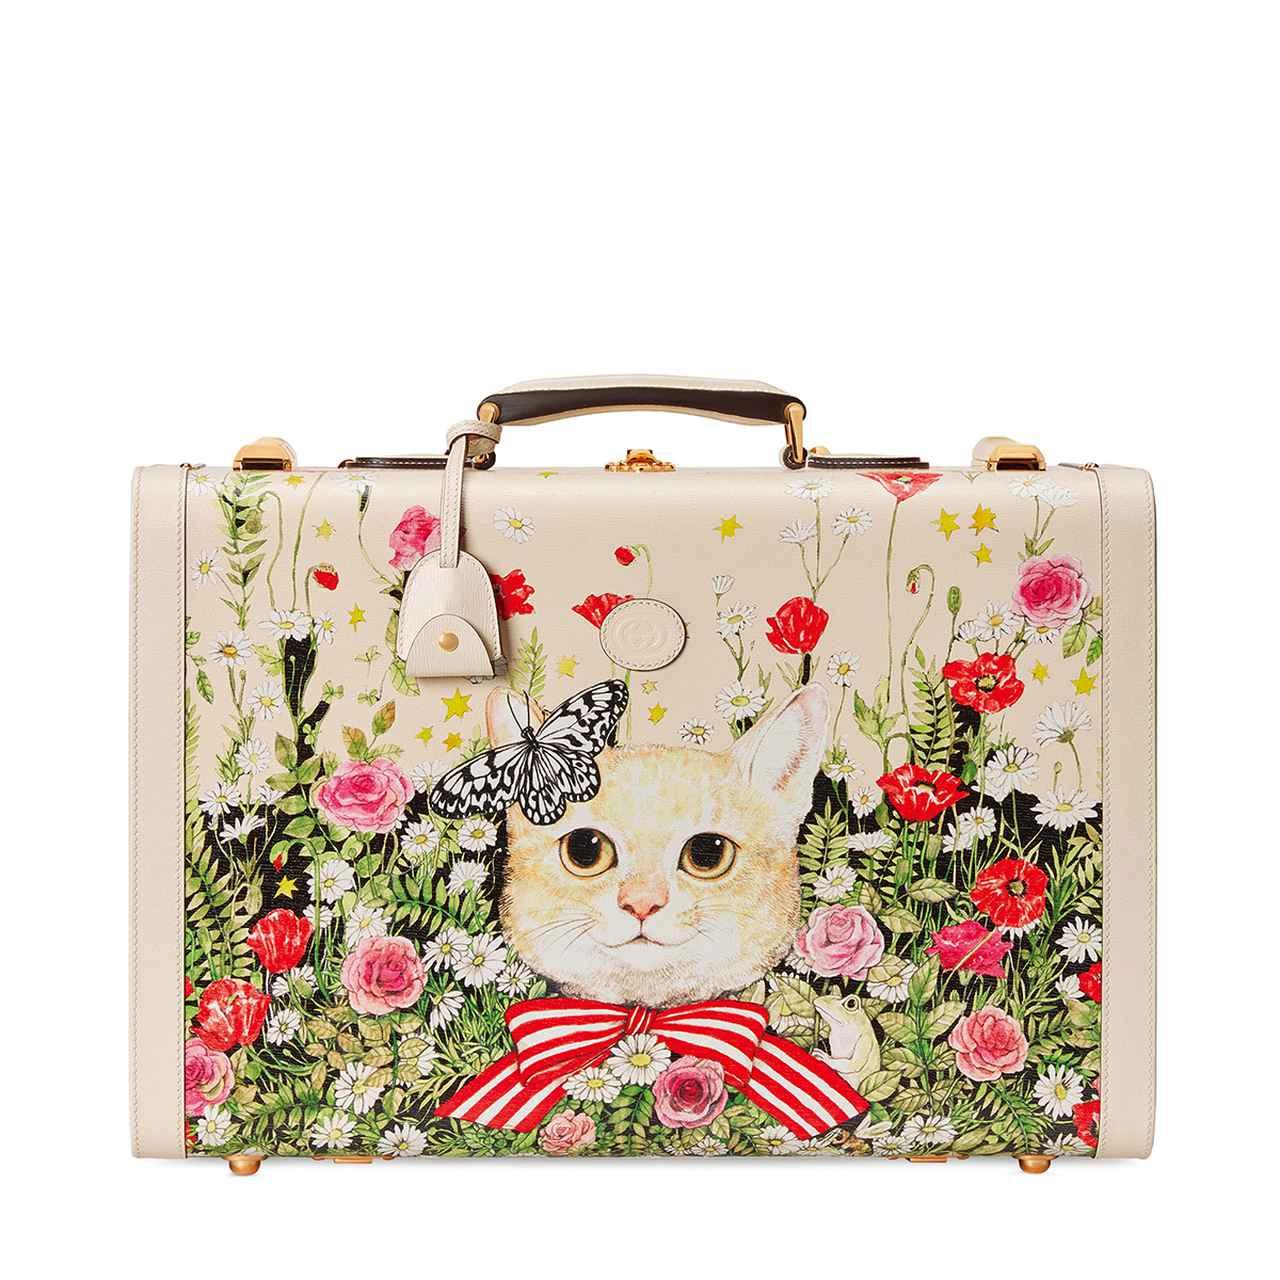 Images : スーツケース